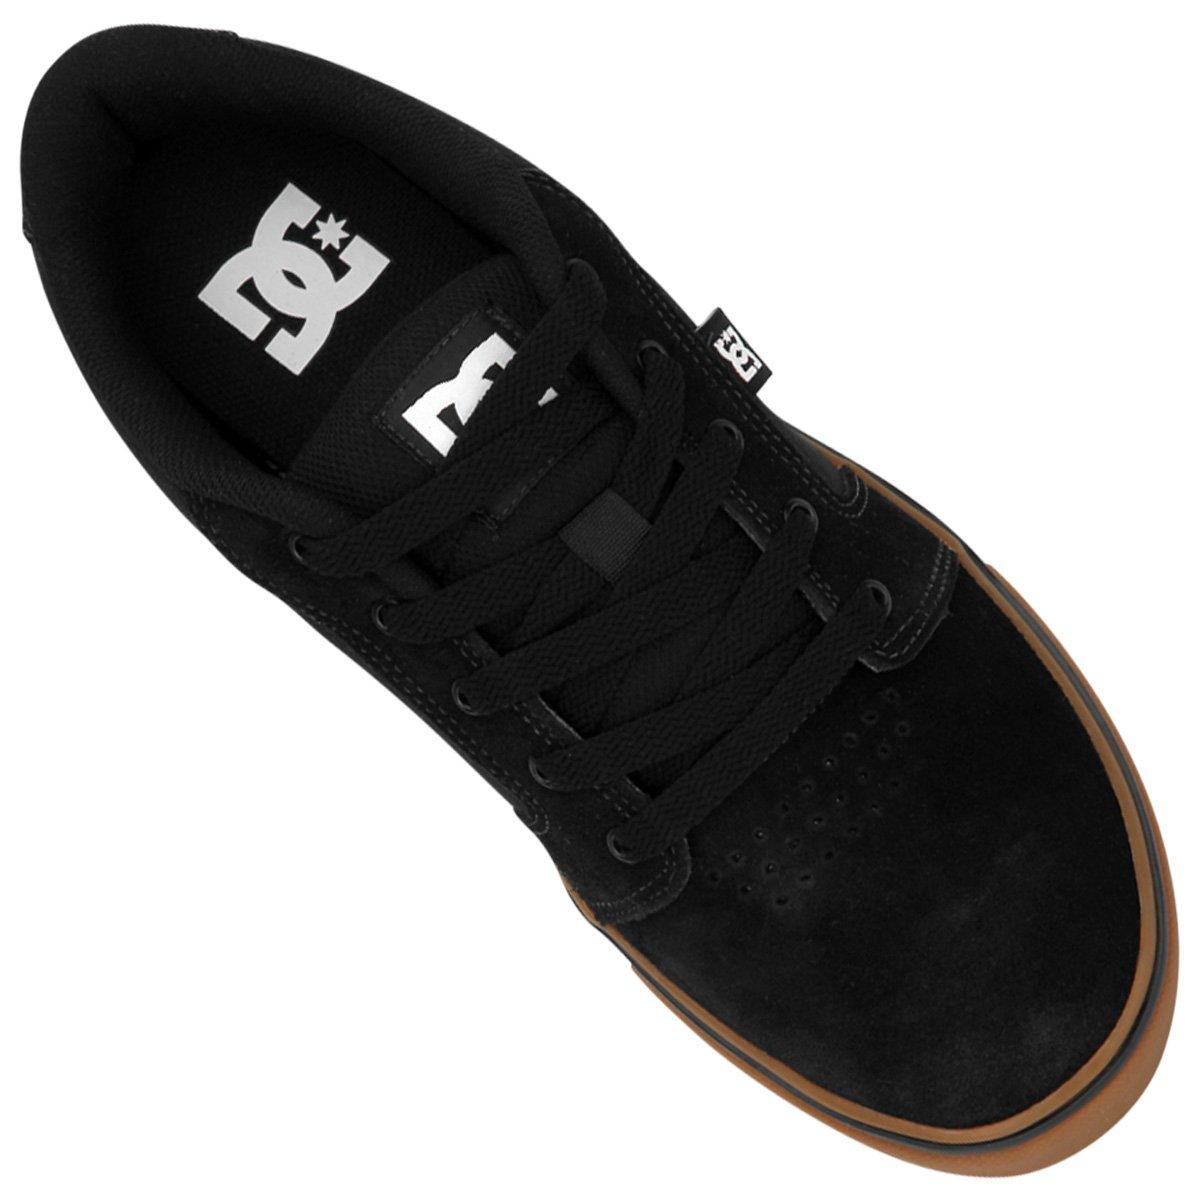 Tênis Dc Shoes Anvil Preto E Marrom Netshoes ef9e9338e5c1c